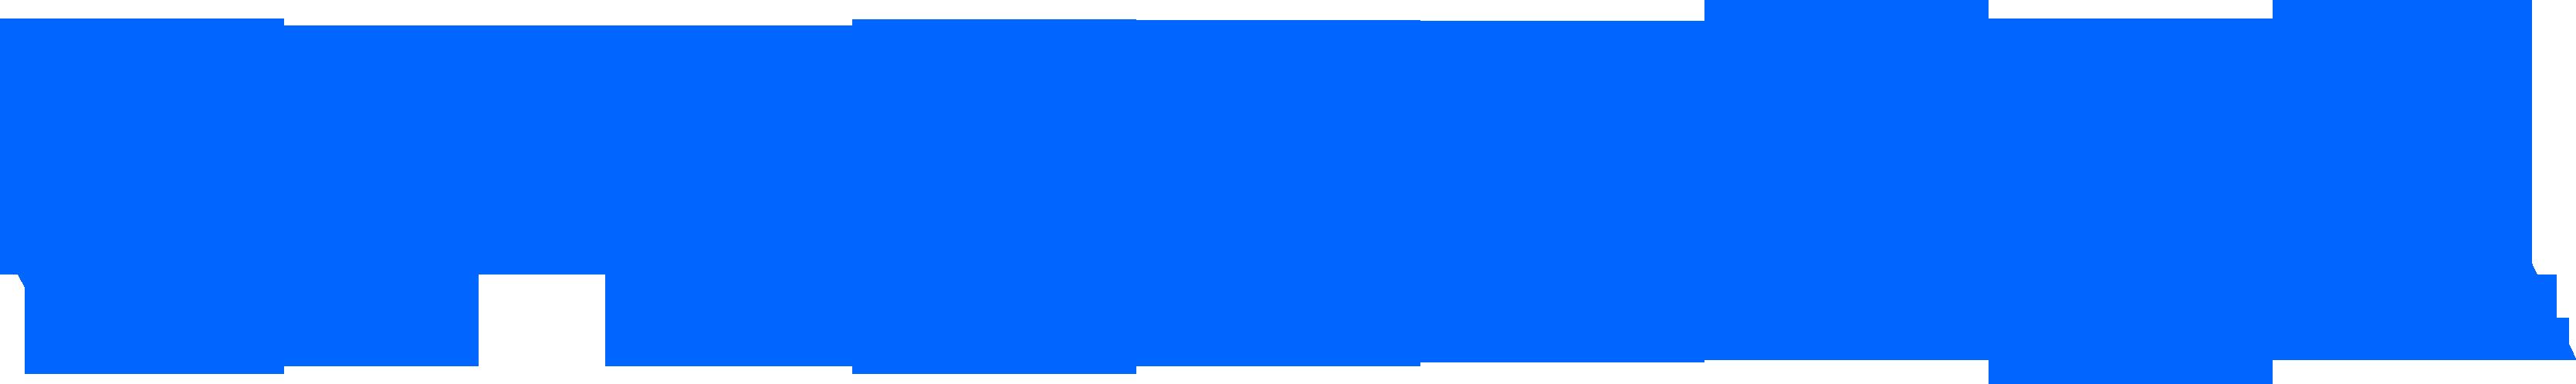 gyspydaivafont4-complete-logob